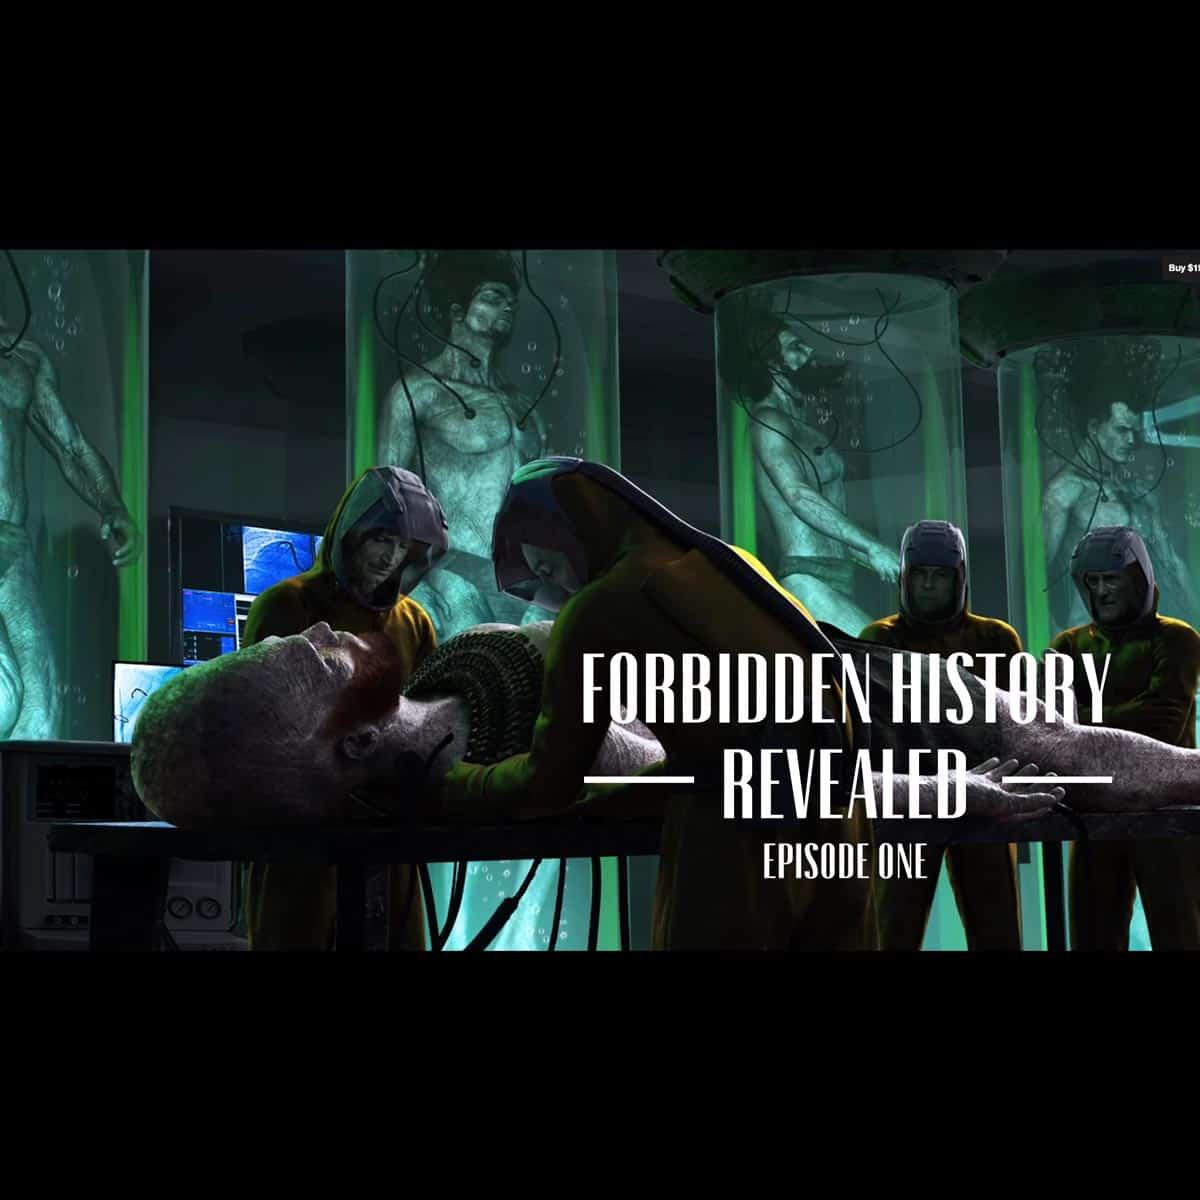 Forbidden History VOD